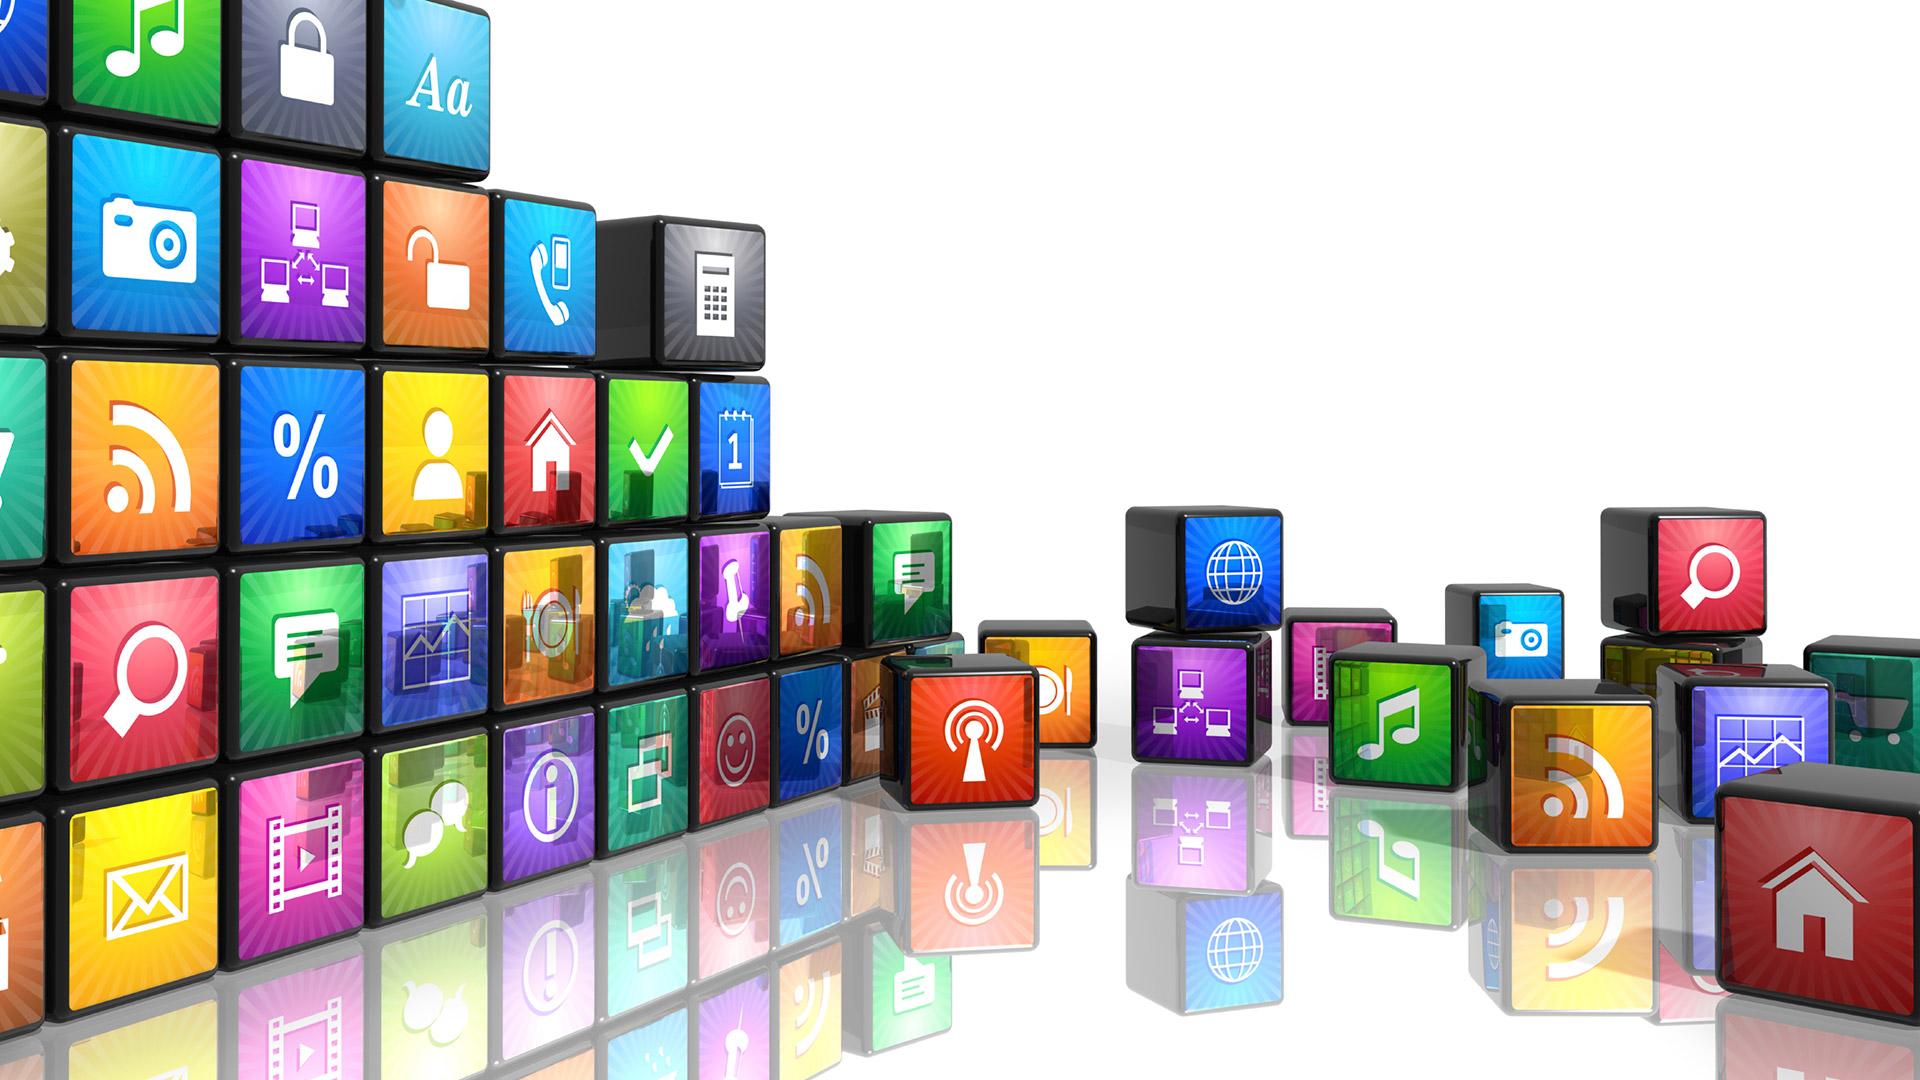 f-ded-µ-a-st-ta-ap-Android-Apps-e-t-d-a-t-d-t-MIT-wallpaper-wp3601790